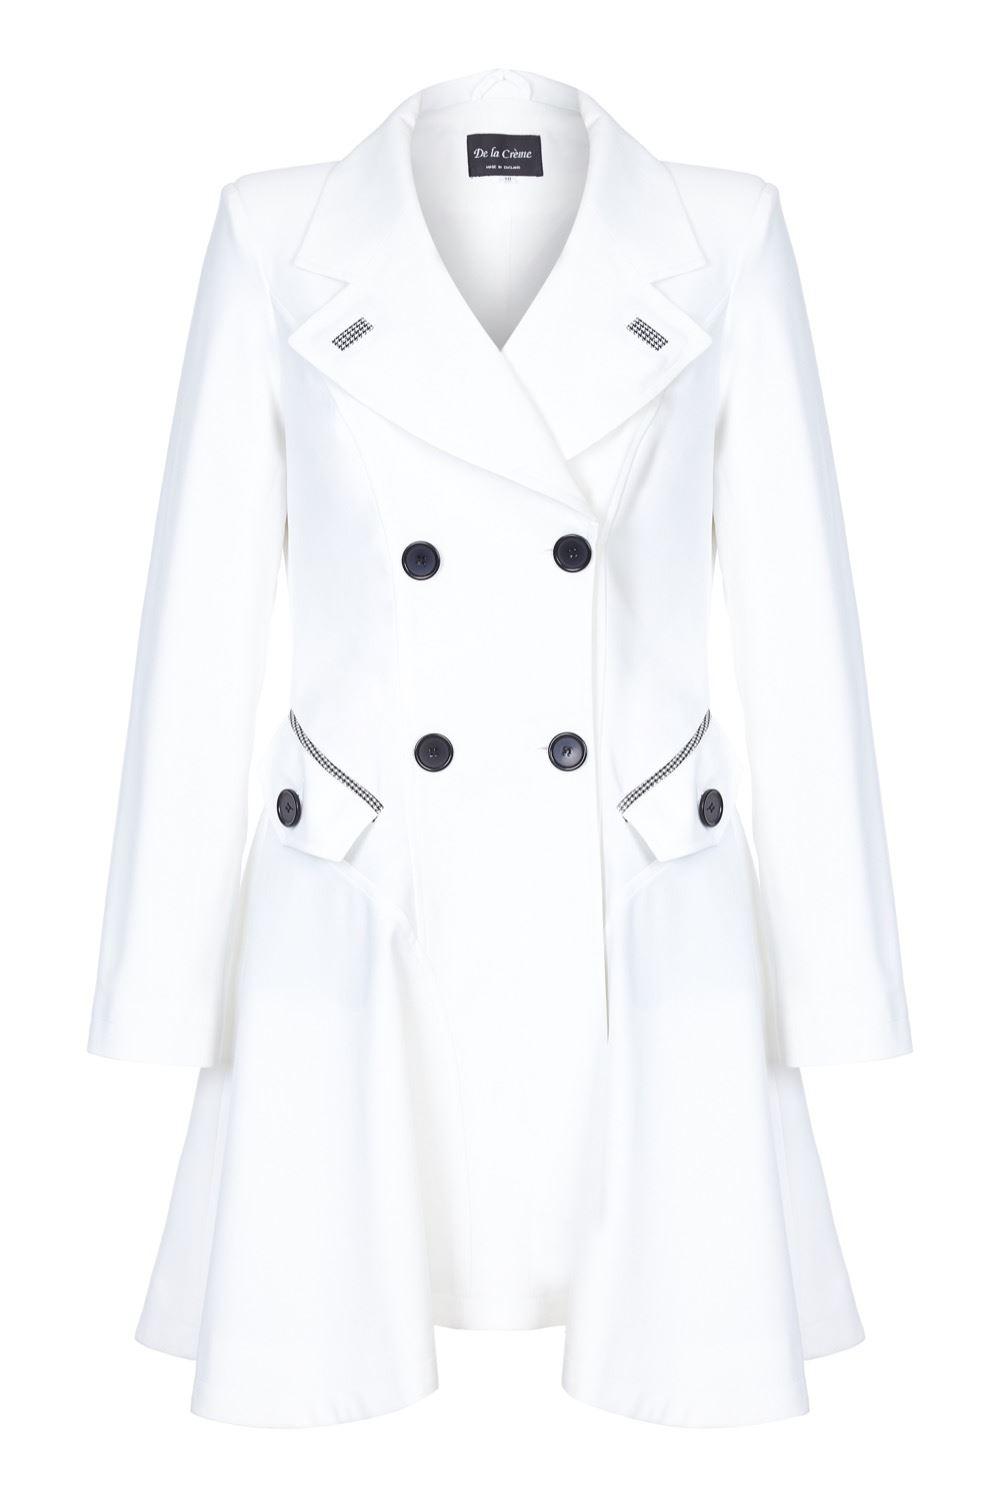 DE La Creme-da donna primavera//estate Dogtooth Trim Doppio Petto flarey Mac Coat